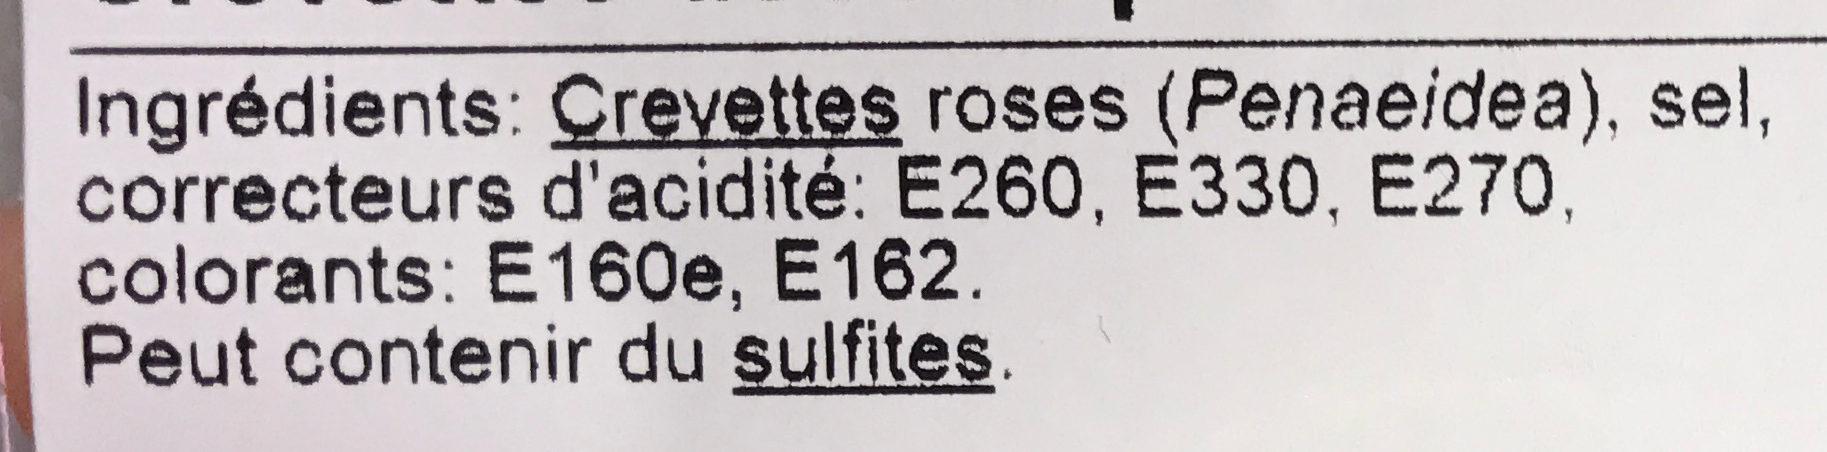 Nos petites crevettes roses - Ingrediënten - fr